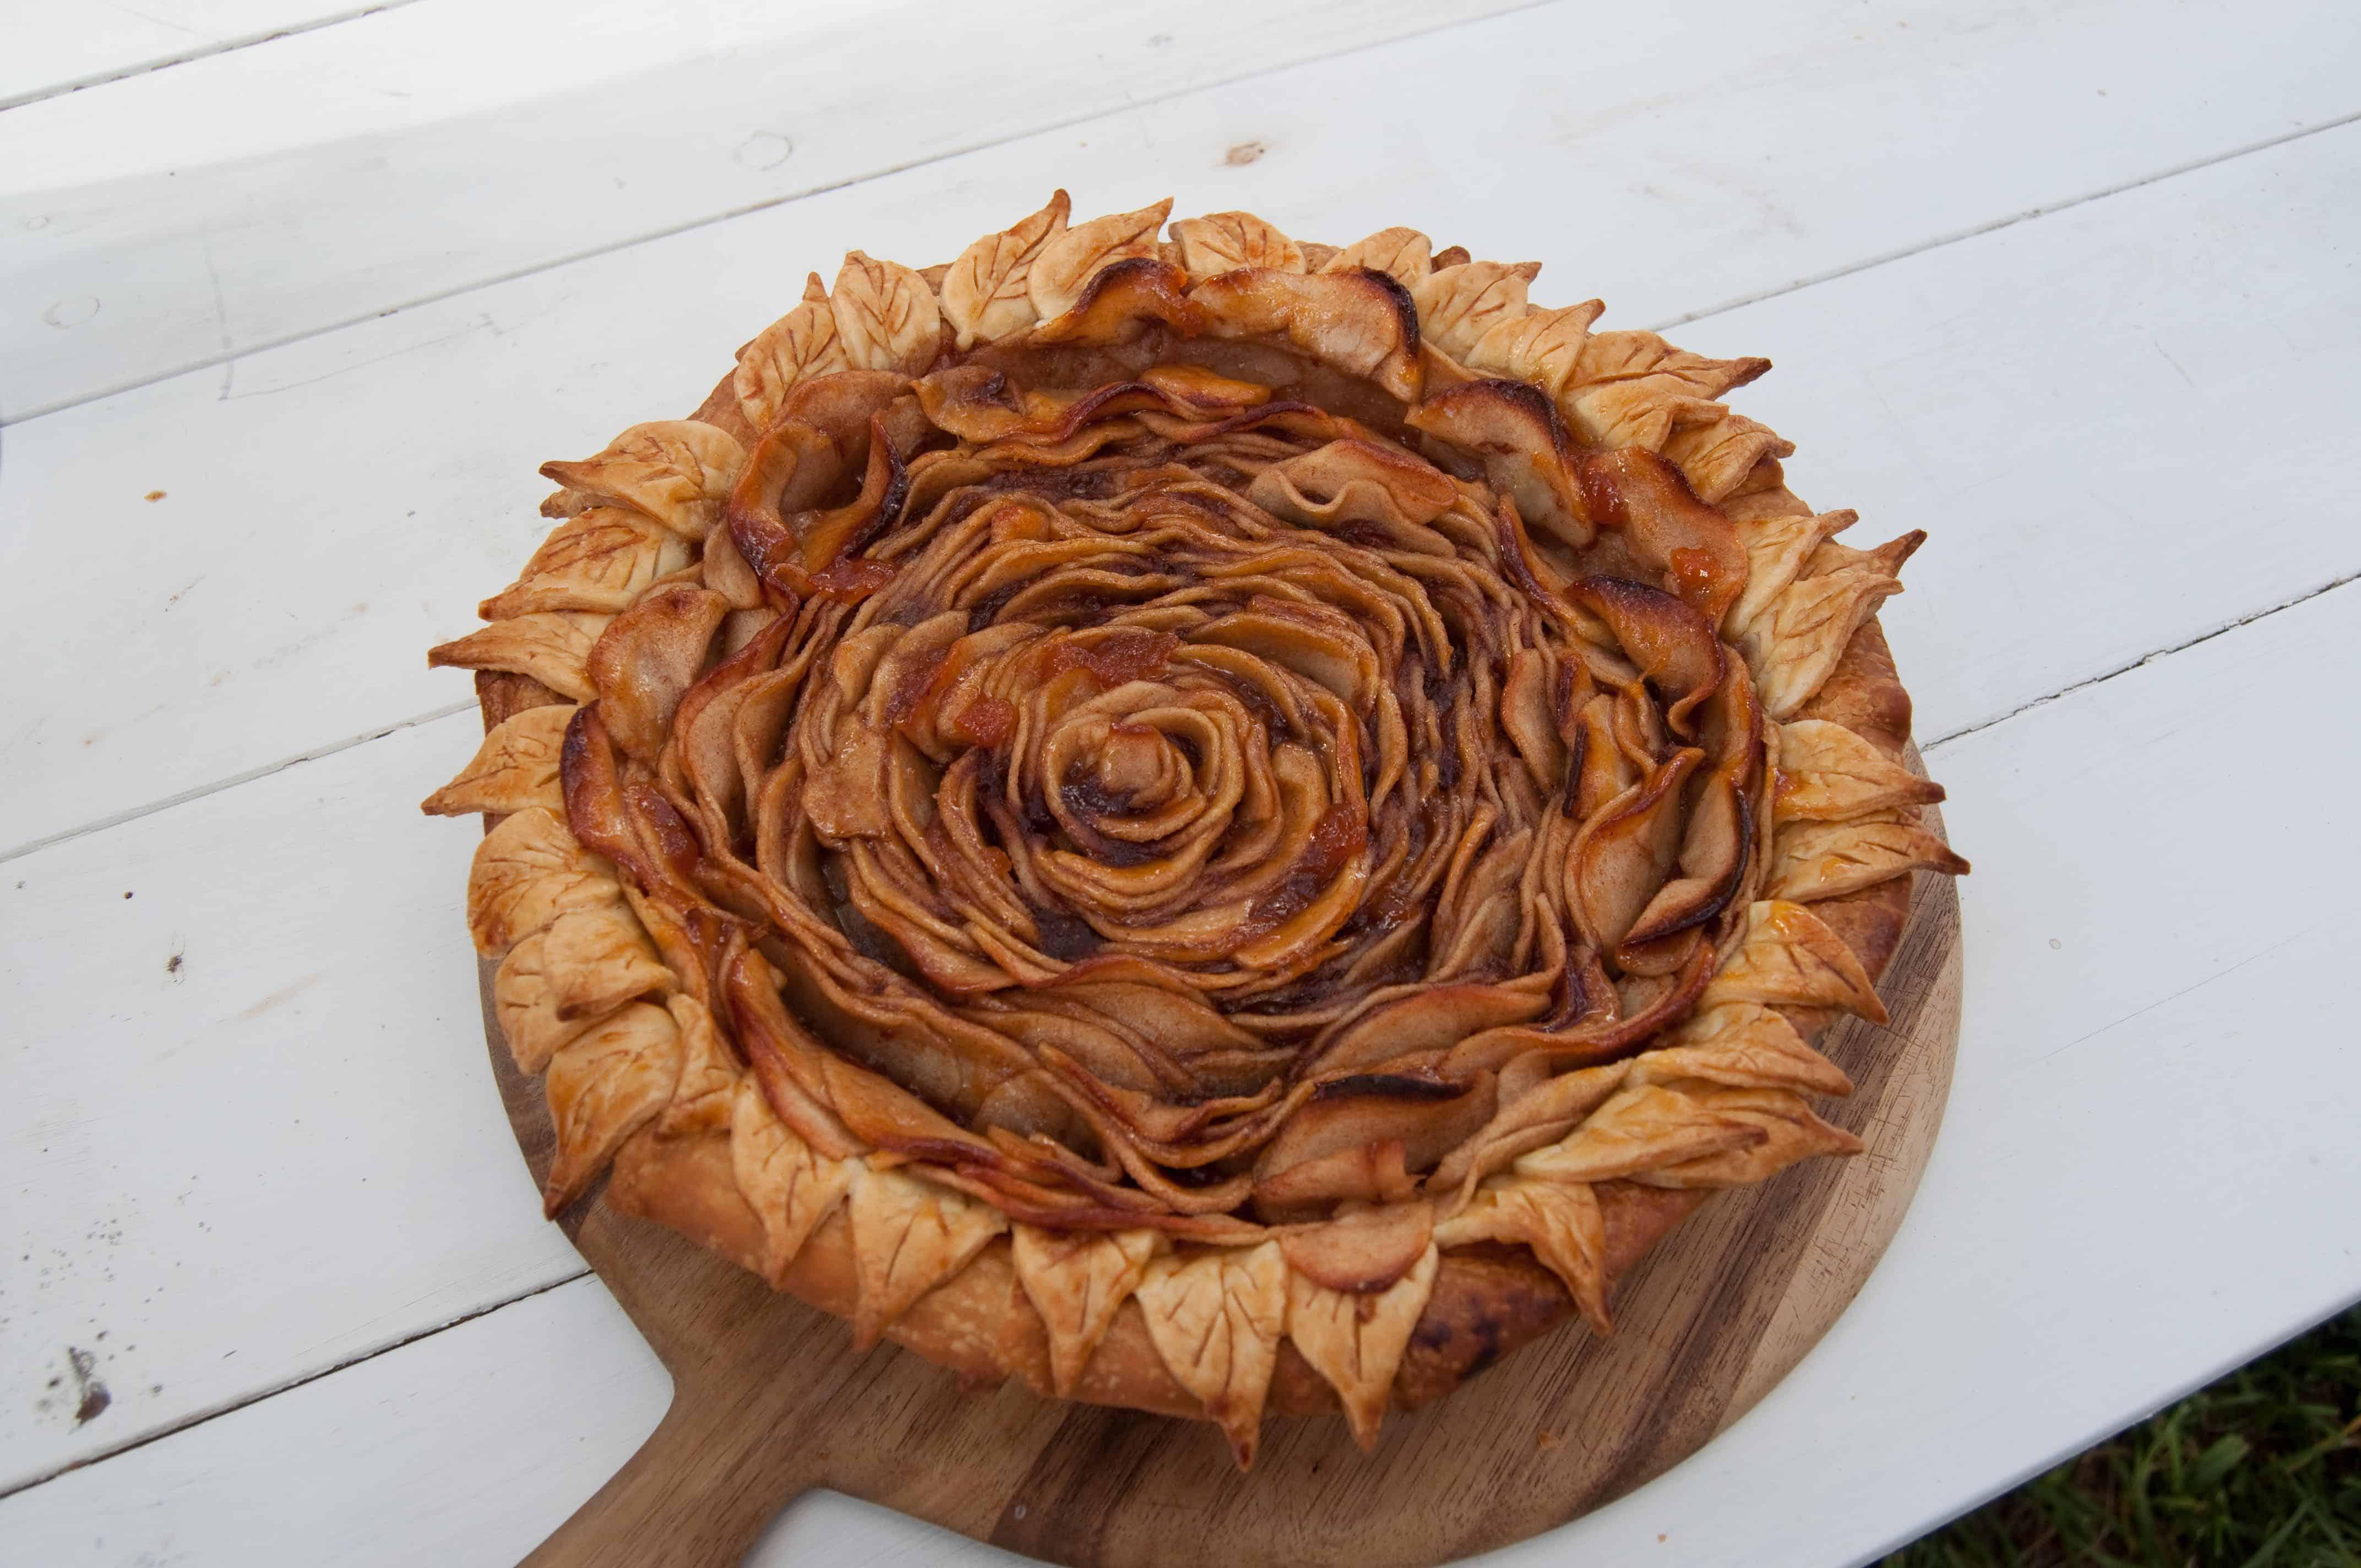 Rose Pie Insane Baking Creations